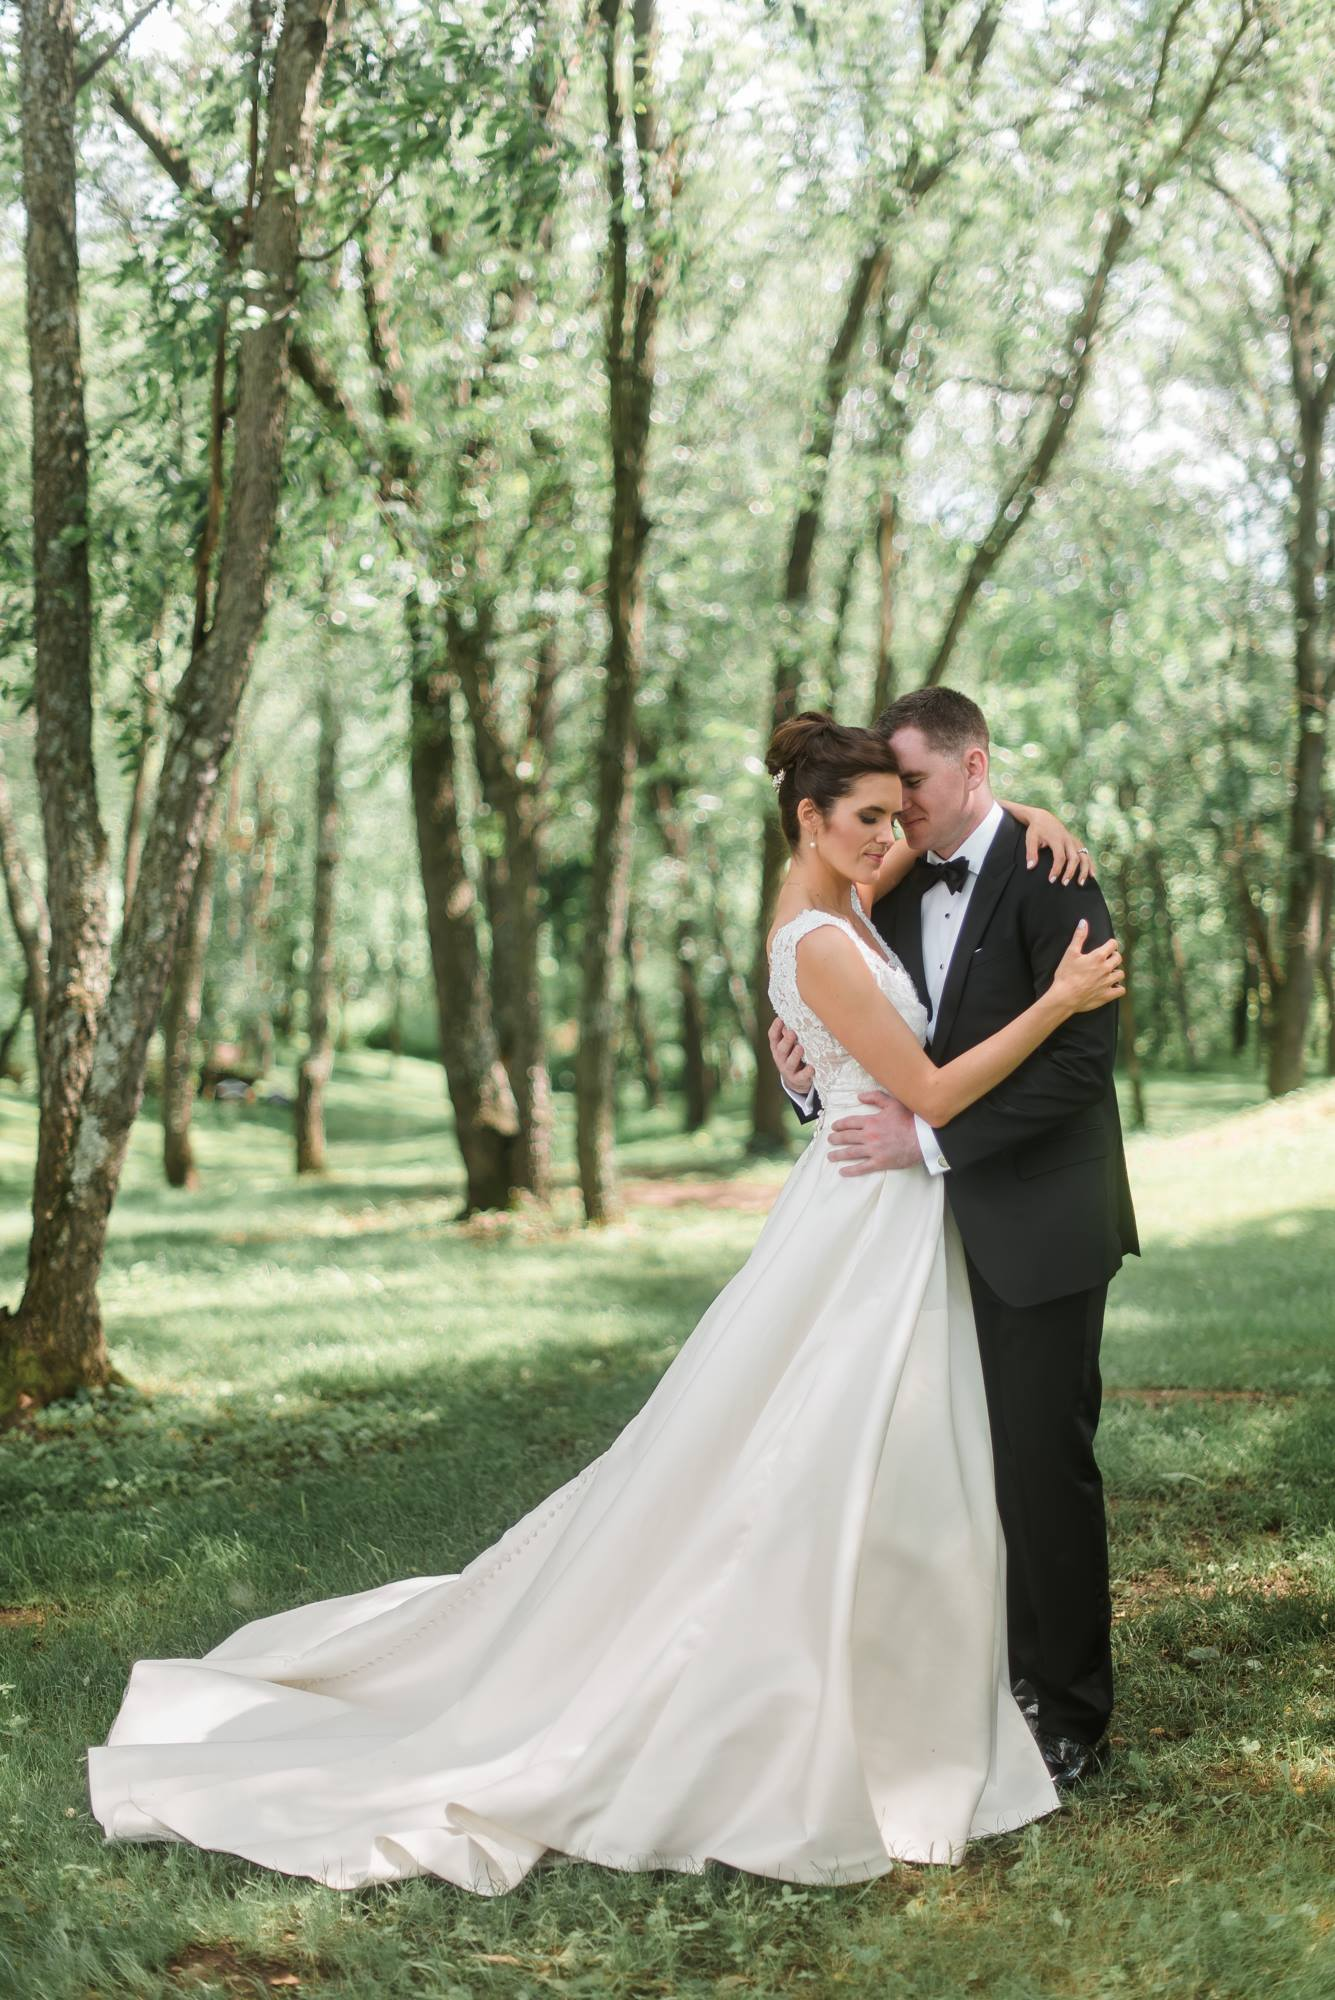 pittsburgh-pennsylvania-backyard-glam-chic-modern-classic-wedding-0017.jpg